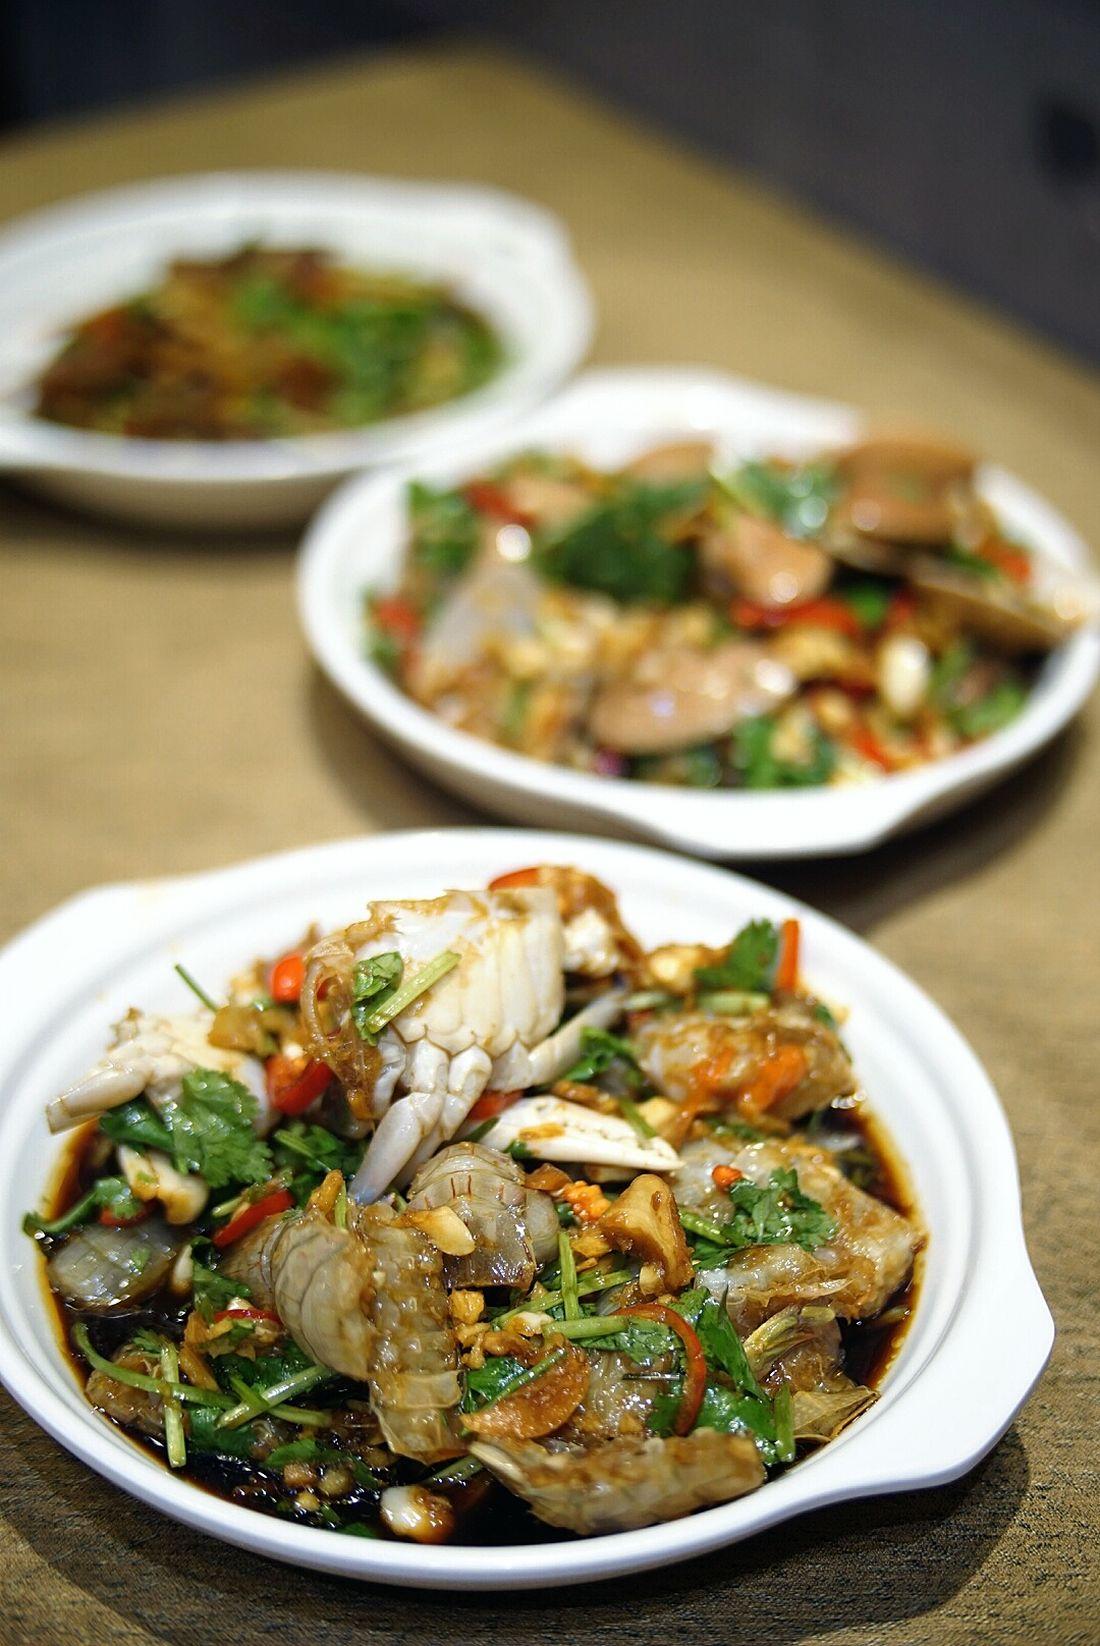 Foodporn Seefood Chaozhou Food